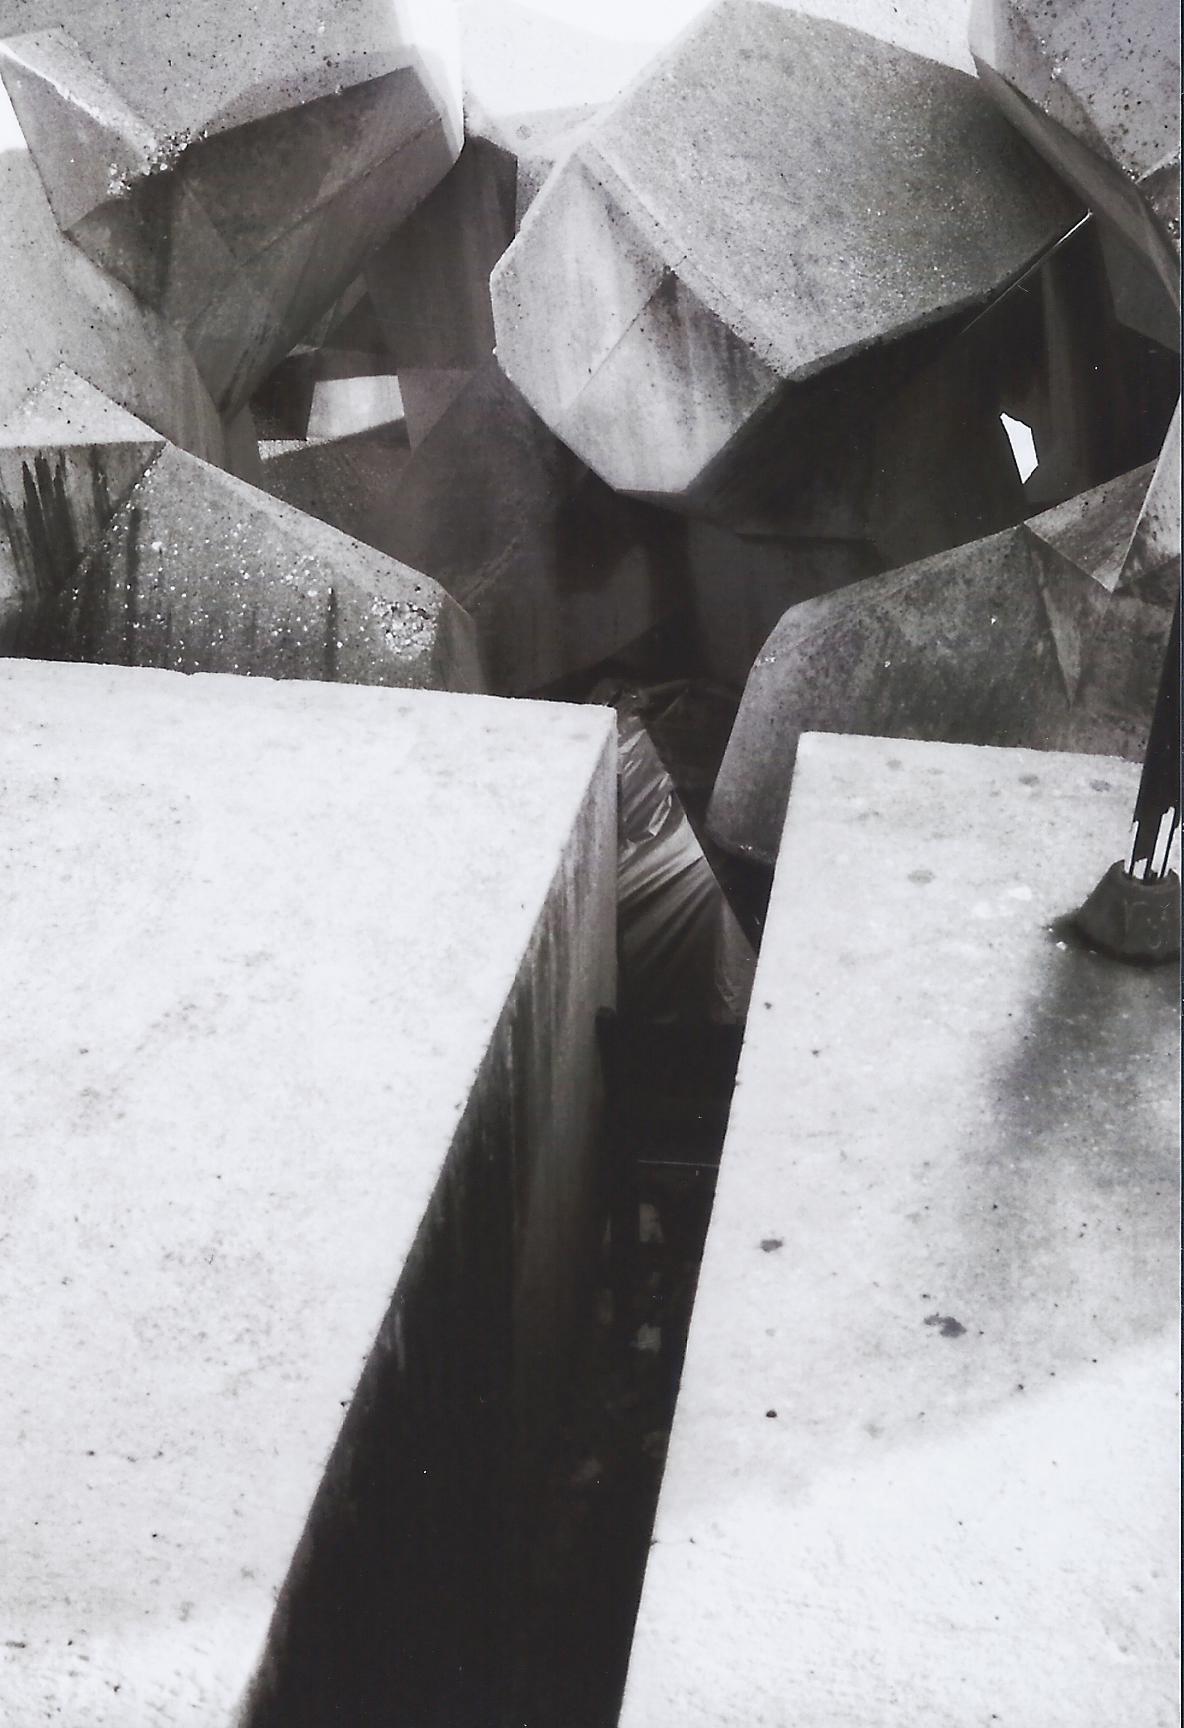 Photograph of concrete structures.